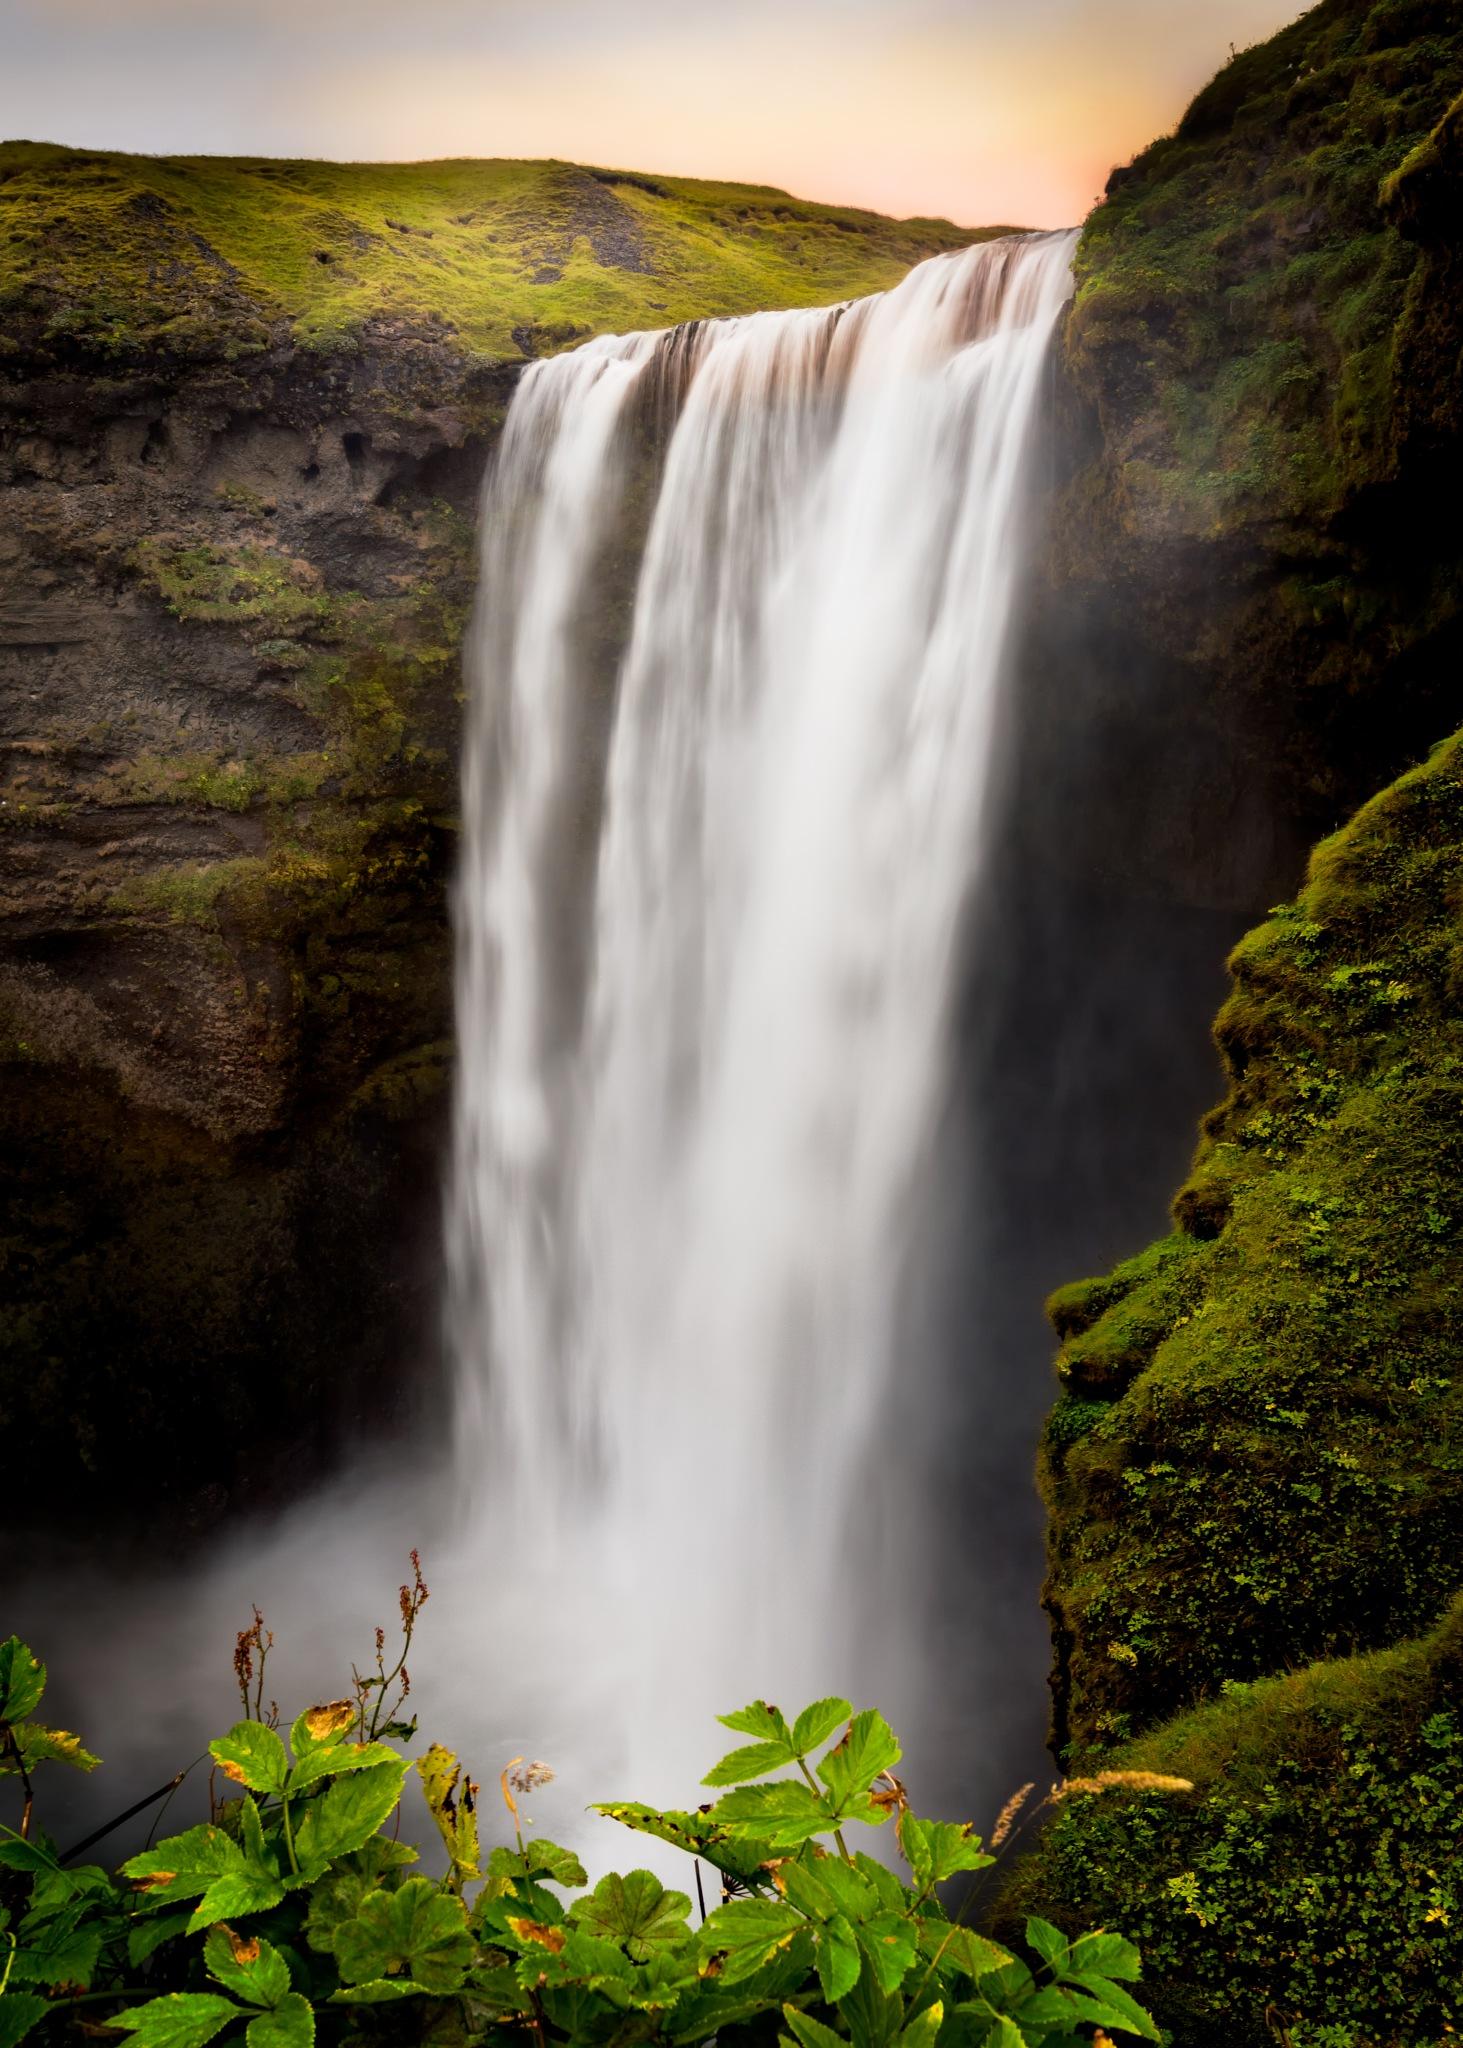 Verdant falls by Rebecca Ramaley